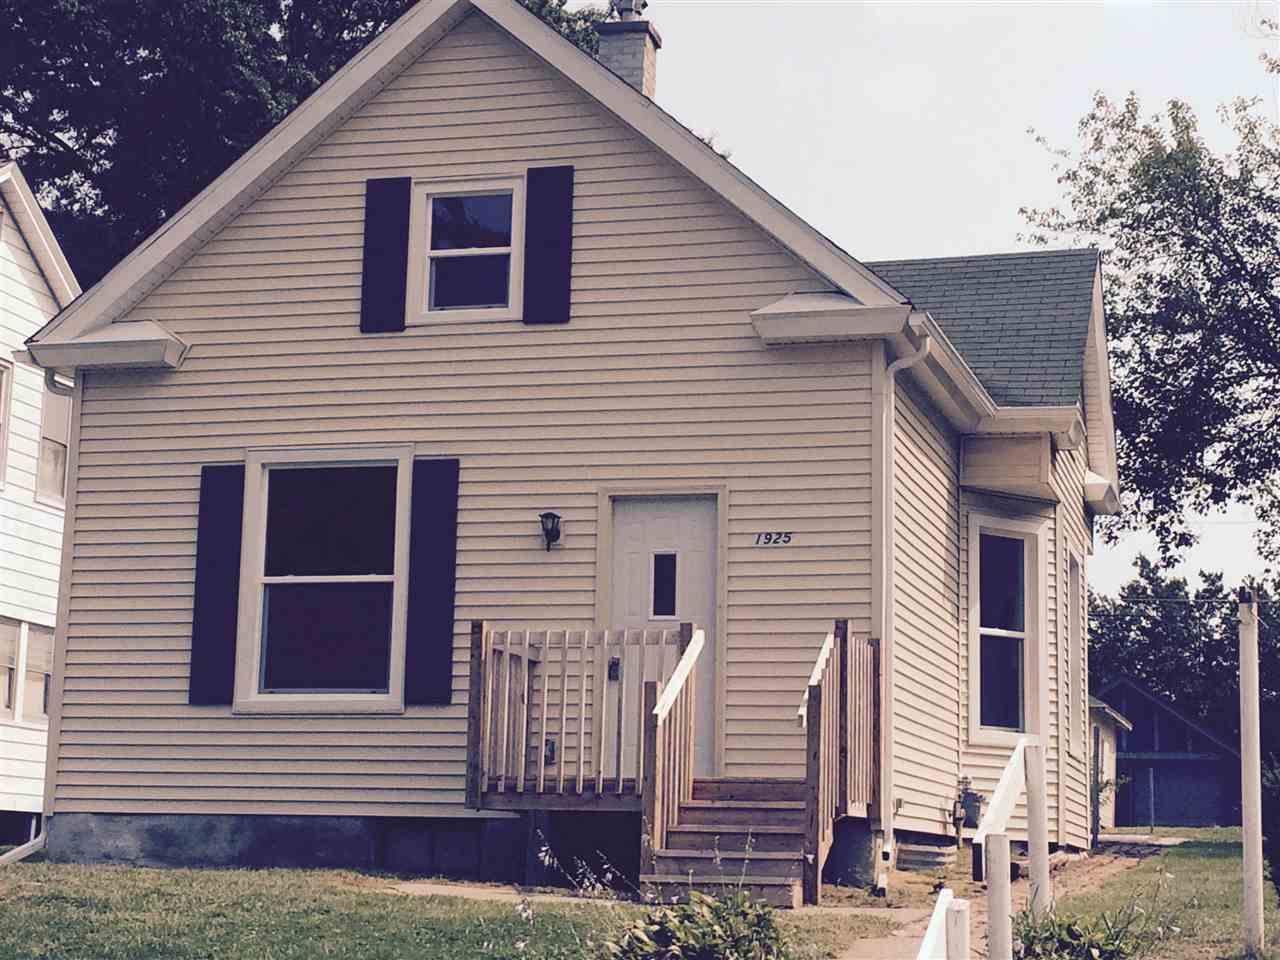 Rental Homes for Rent, ListingId:35167564, location: 1925 VINE Davenport 52804